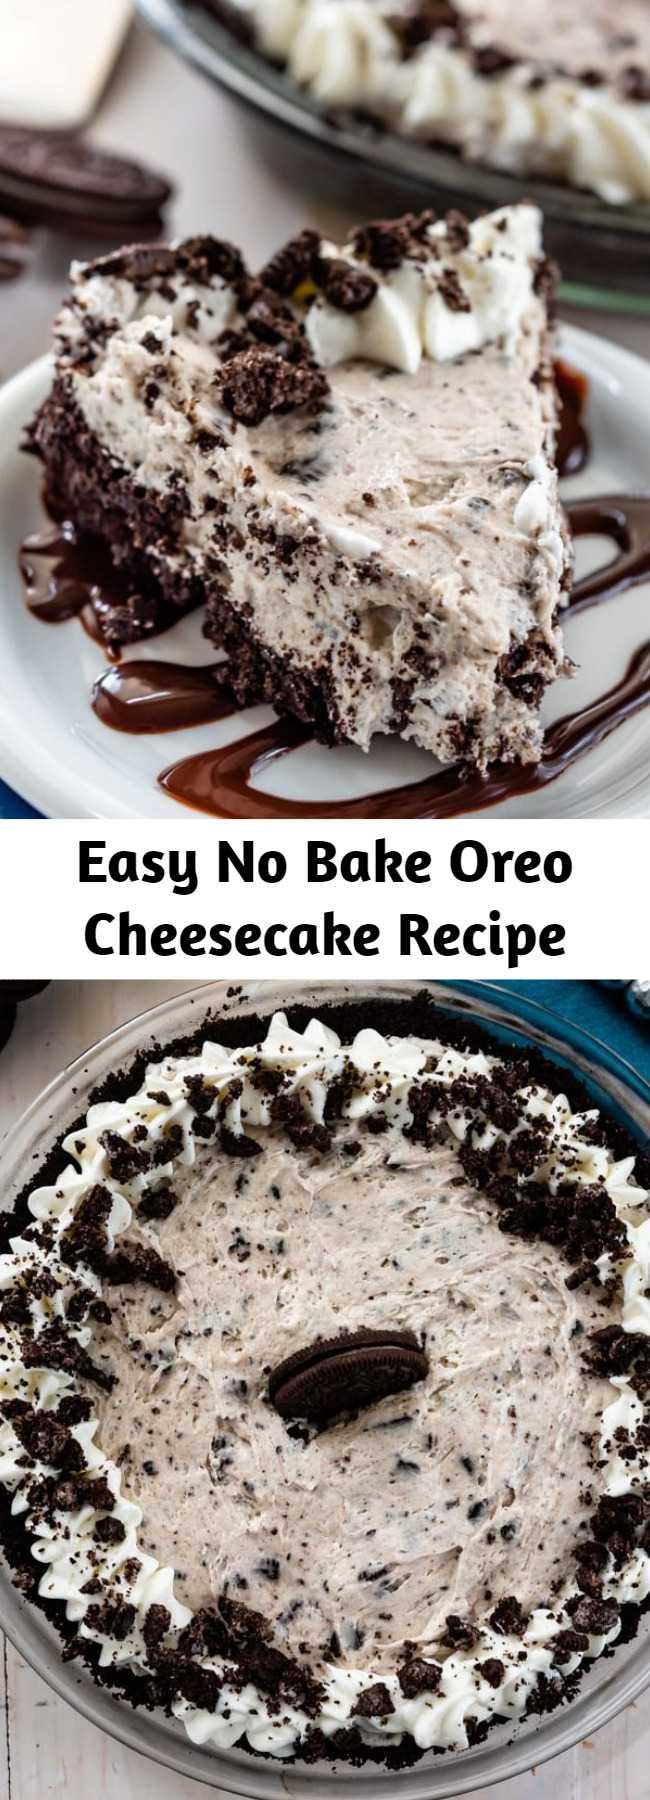 Easy No Bake Oreo Cheesecake Recipe - This No Bake Oreo Cheesecake is easy, delicious, and the perfect pie! Start with a homemade Oreo crust and fill it with cookie filled cheesecake for the perfect no bake cheesecake!